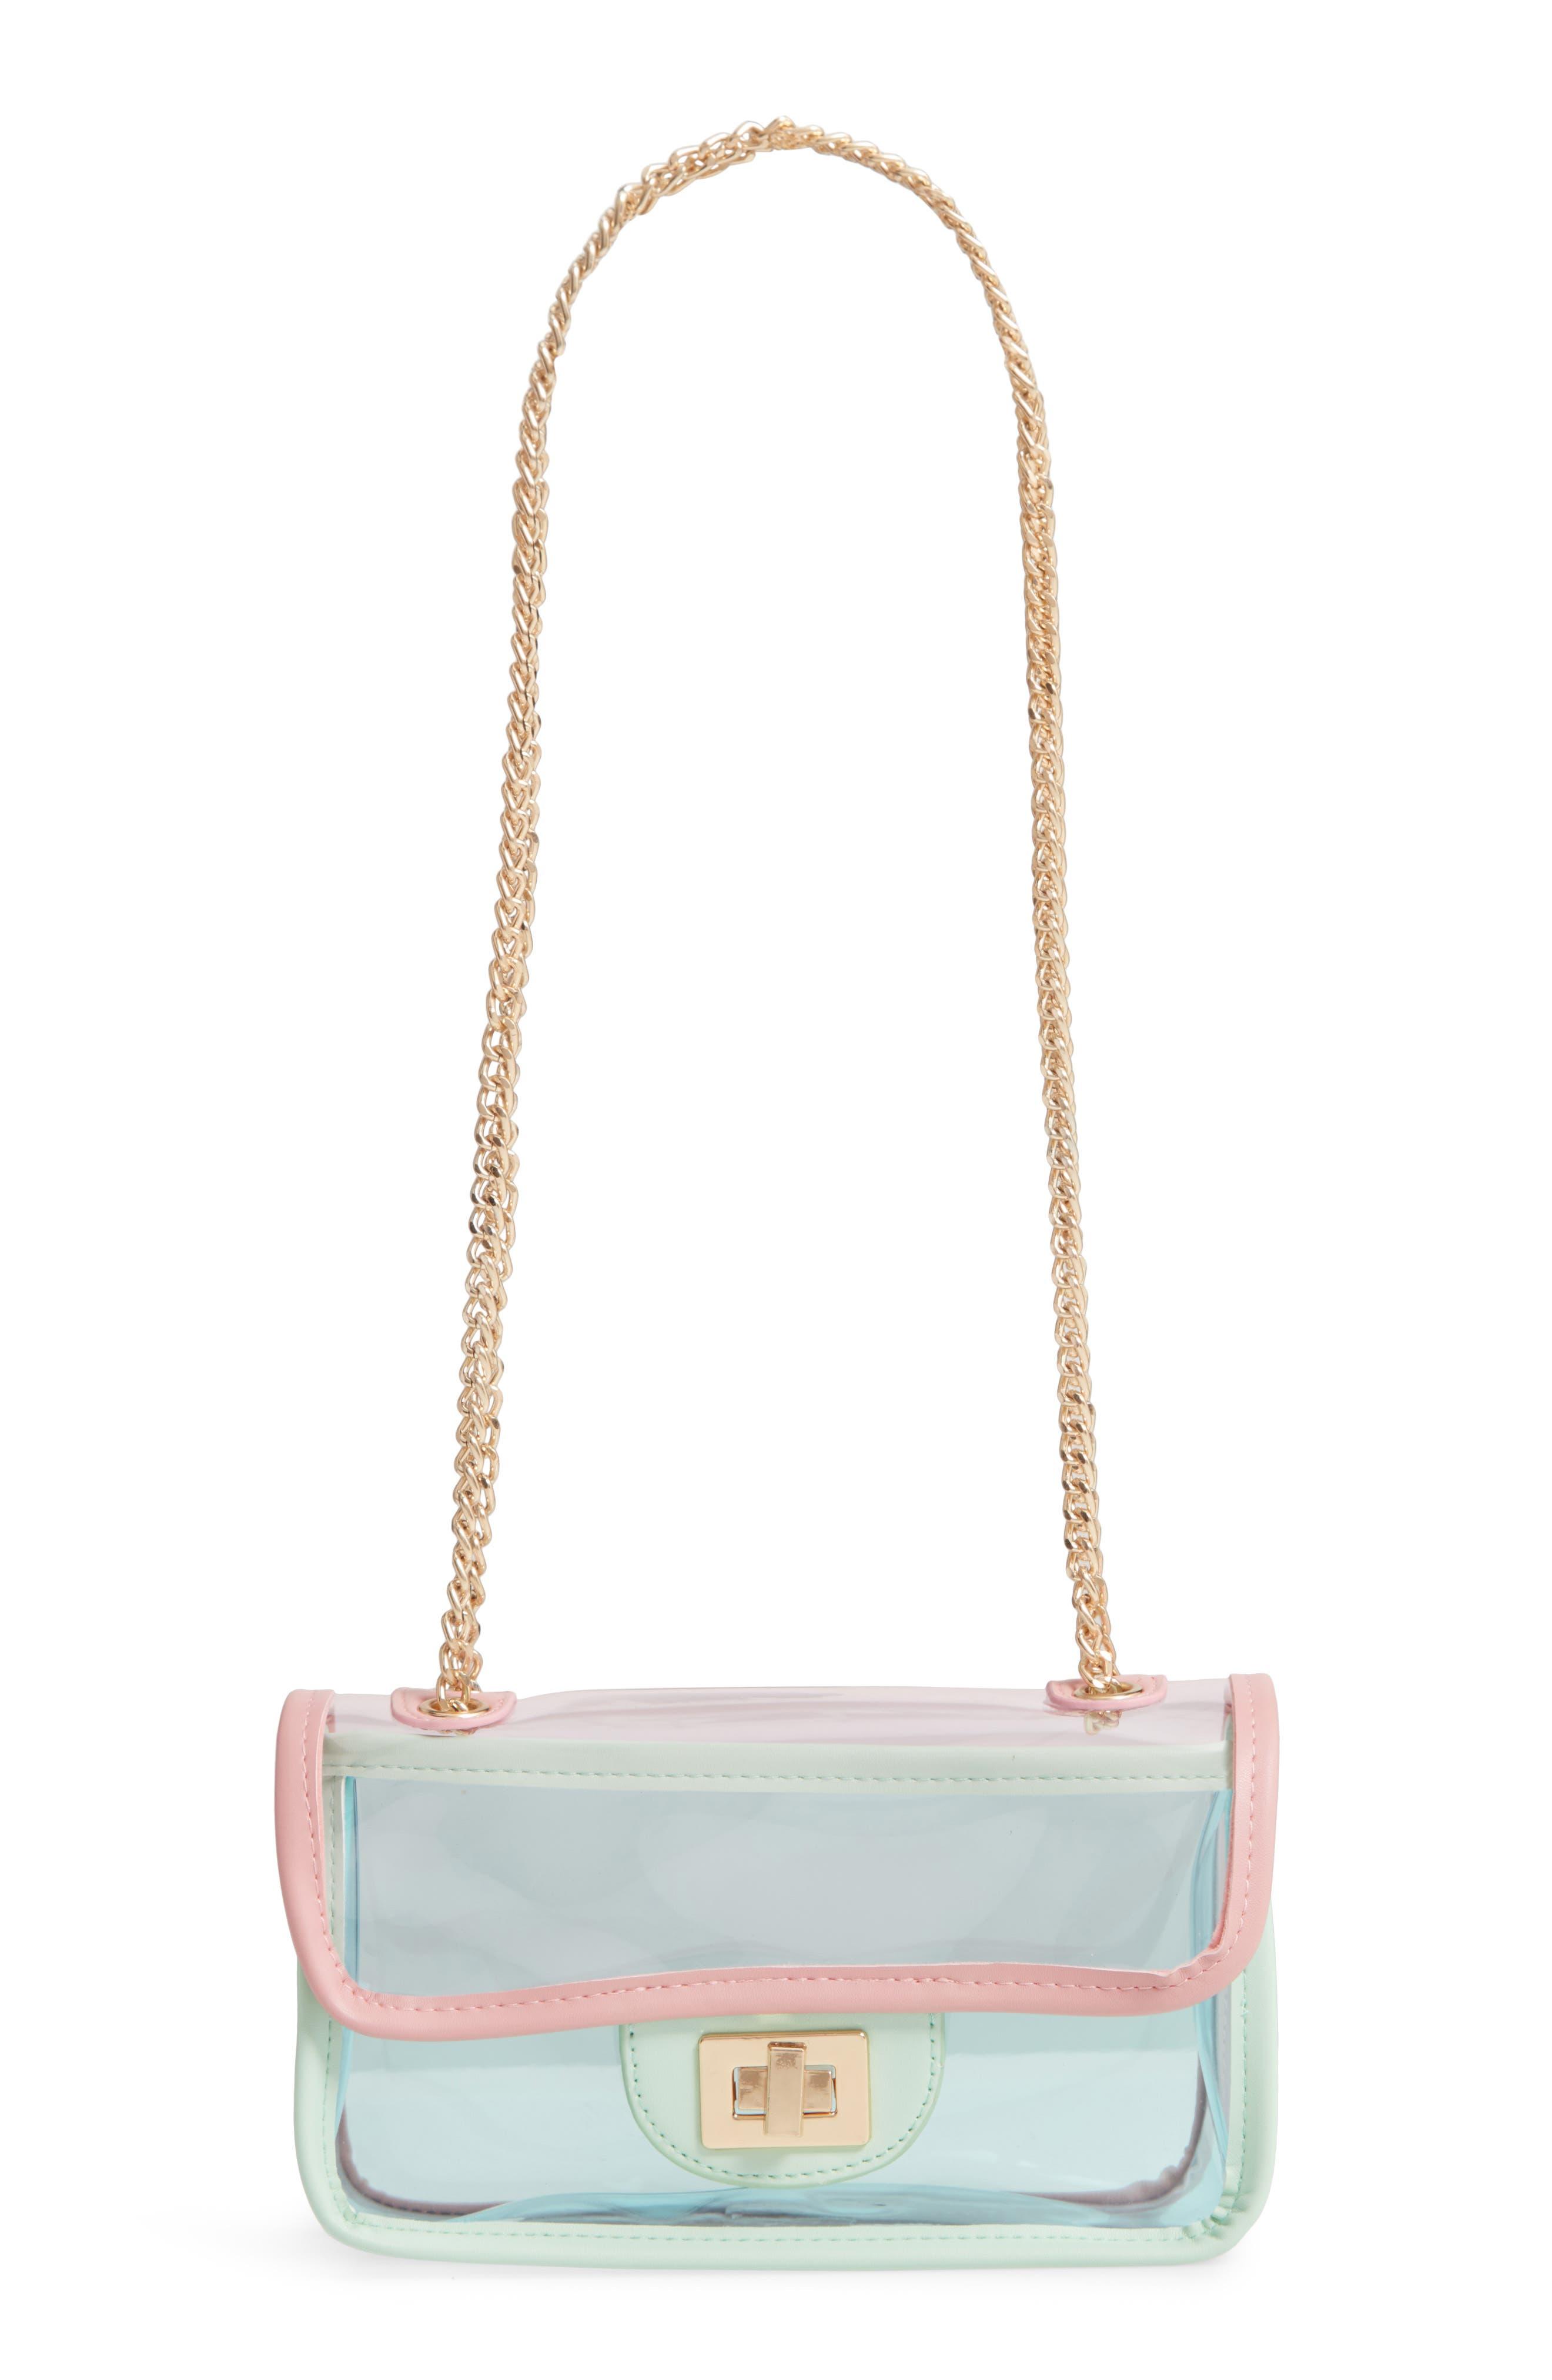 JANE & BERRY Transparent Crossbody Bag, Main, color, PINK MULTI